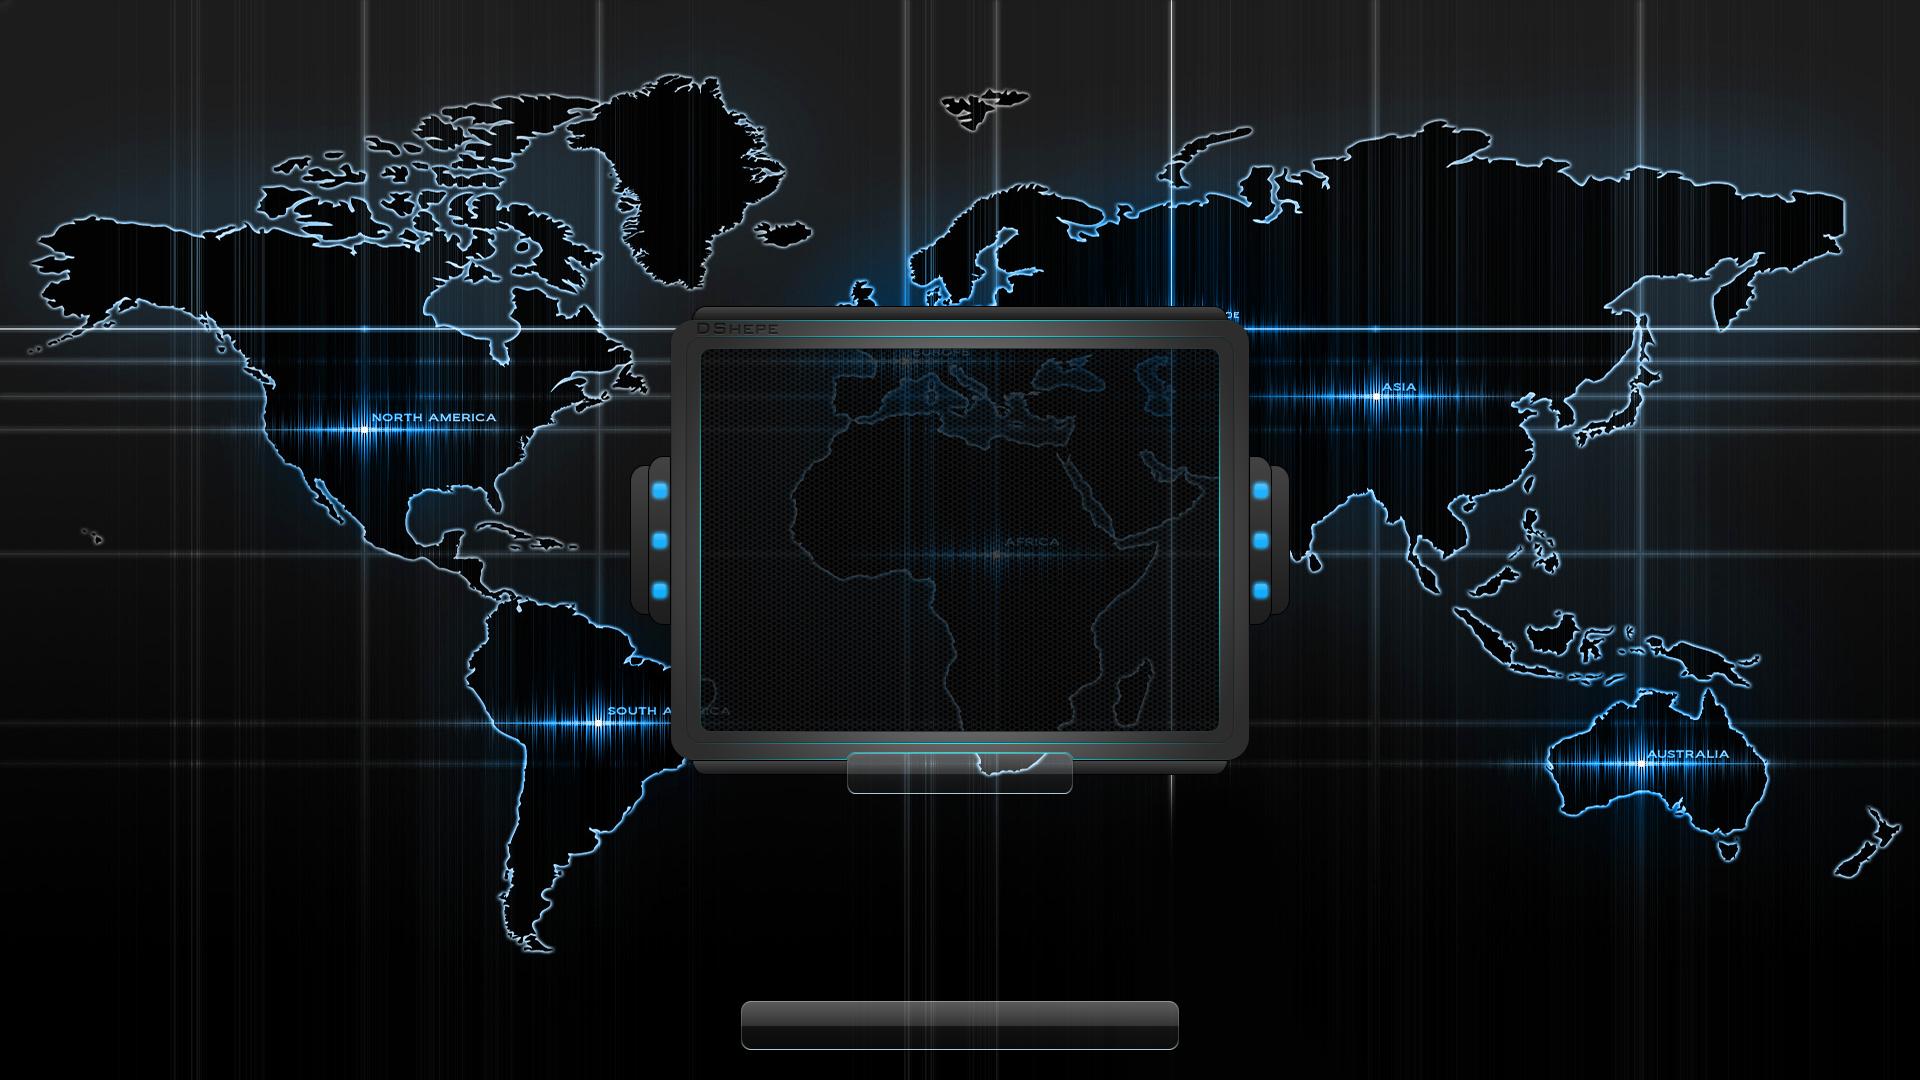 47 Wallpaper Lock Screen Windows 7 On Wallpapersafari